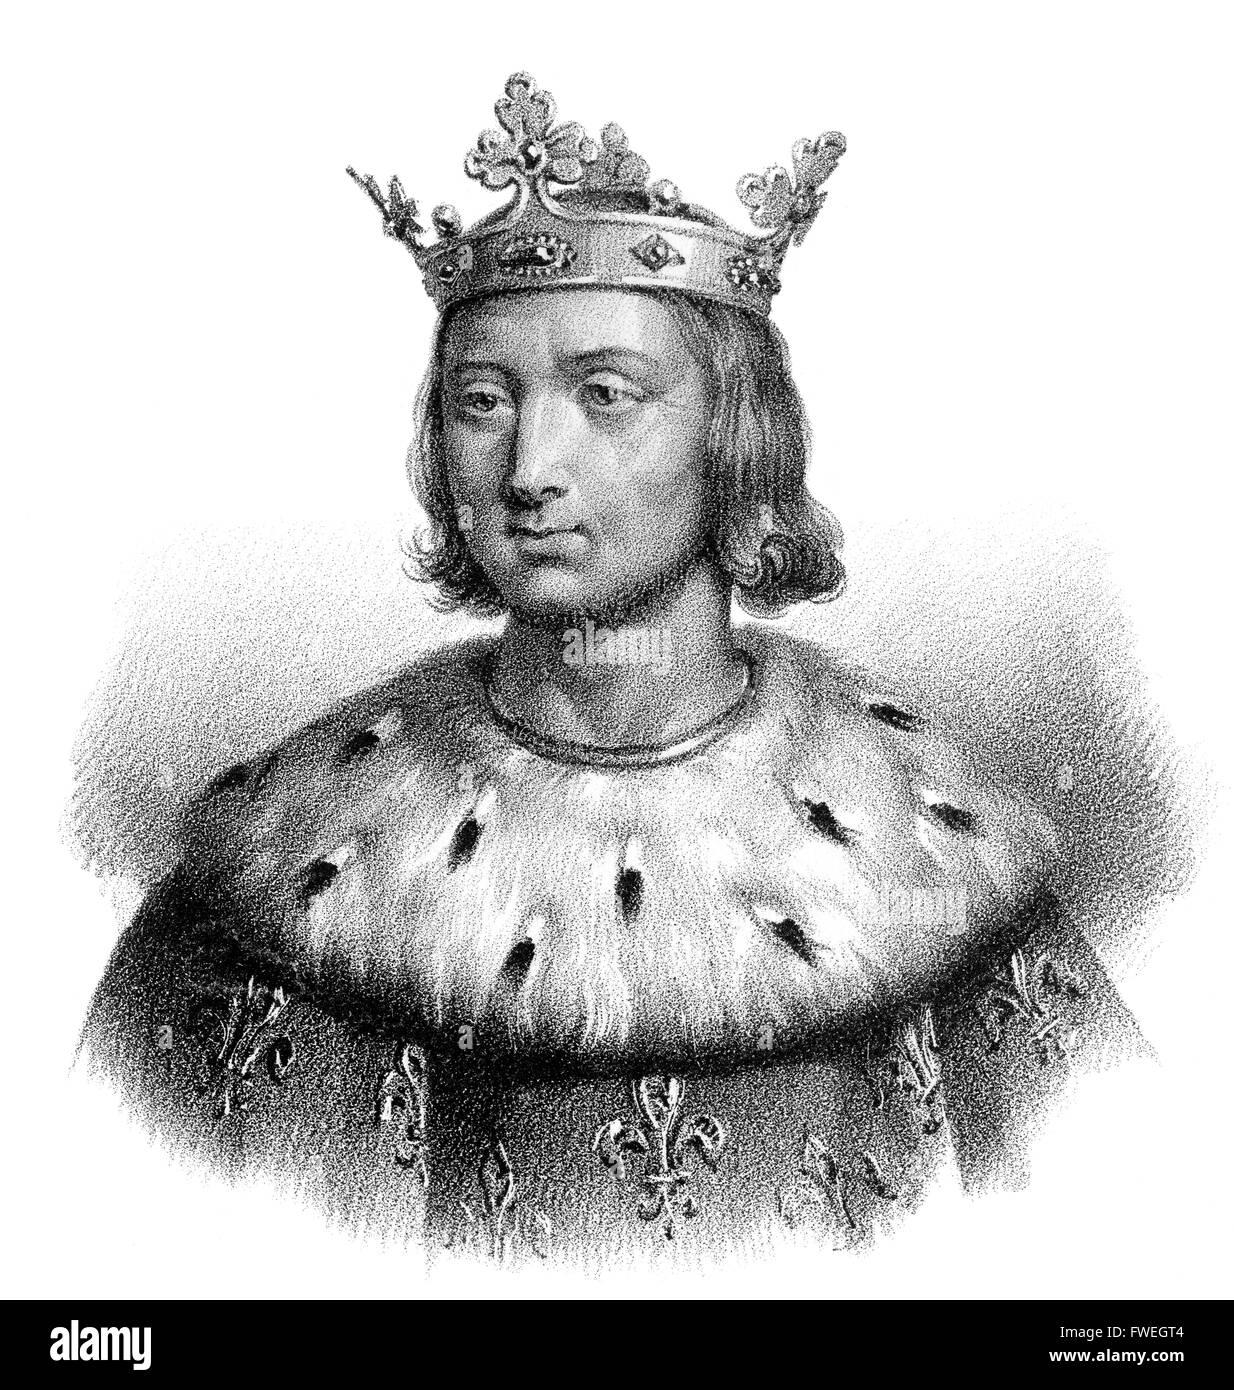 Philip VI of Valois, Philipp VI., Philippe VI de Valois, 1293-1350, called the Fortunate or le Fortuné, first - Stock Image